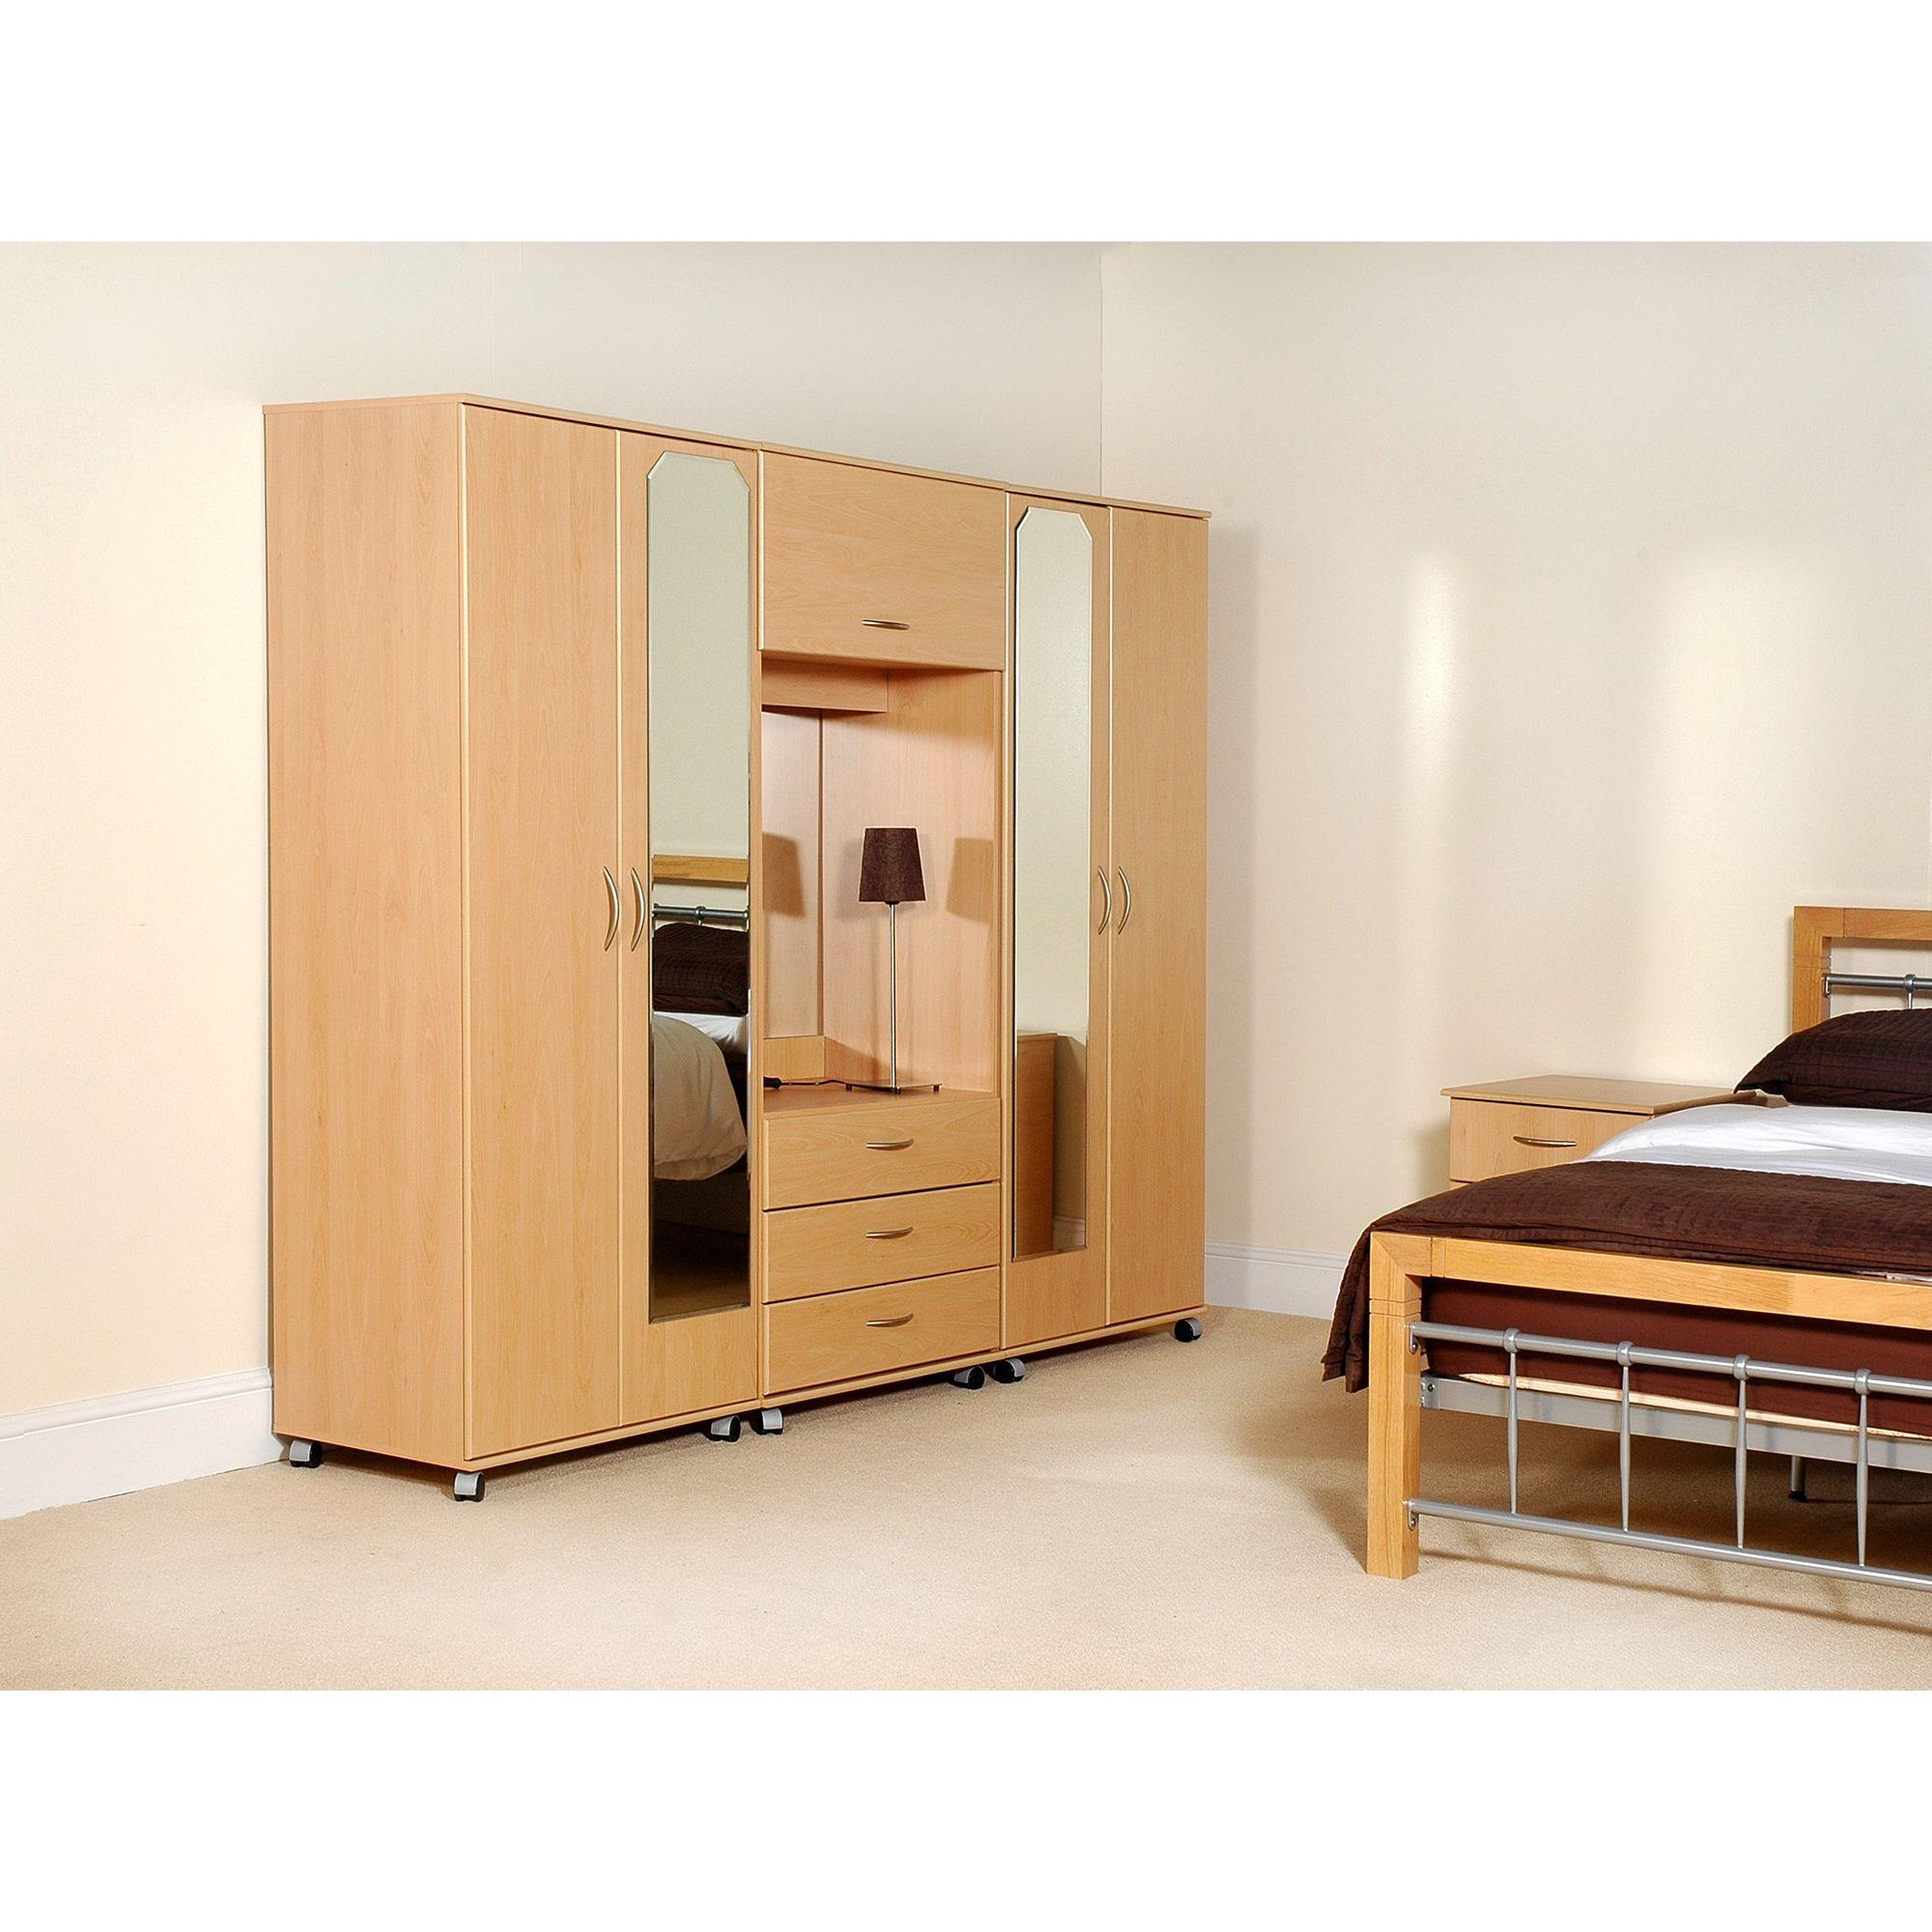 Ideal Furniture New York 4 Door Fitment - Oak at Tesco Direct